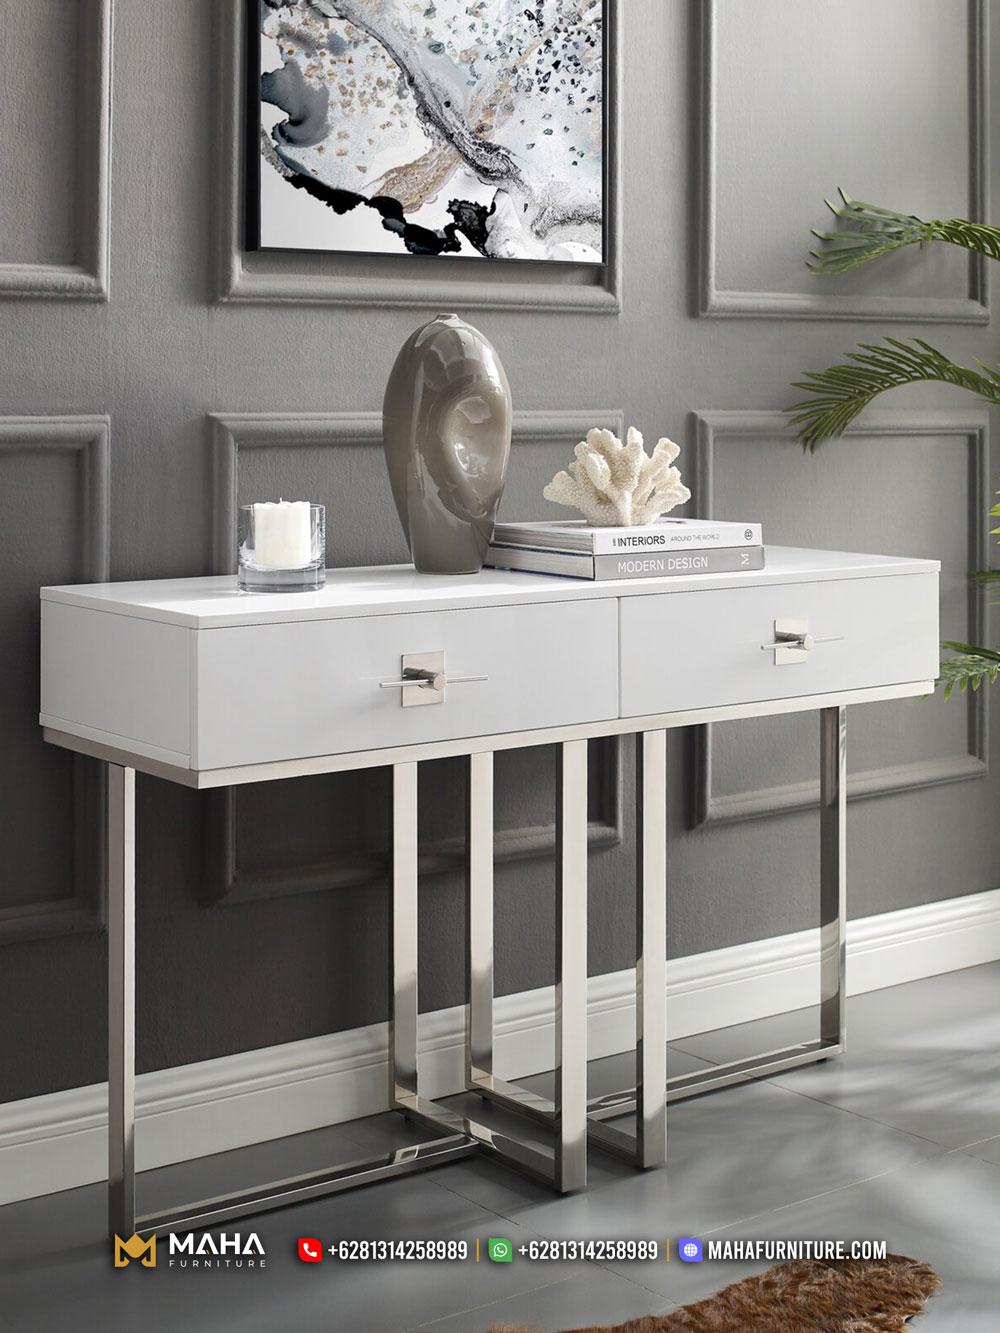 Set Meja Konsul Minimalis Industrial Furniture Jepara Exclusive MF284